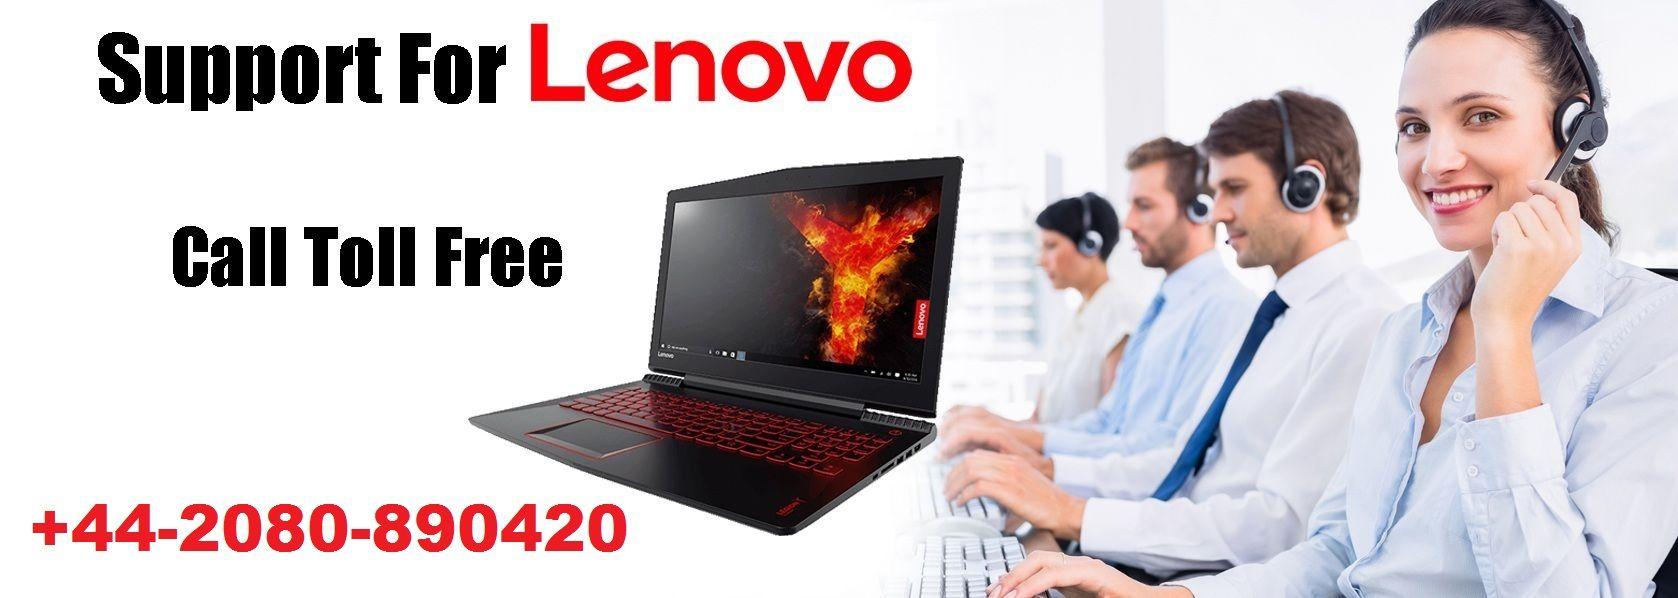 How do I reset a Lenovo Laptop? - Lenovo Technical Support Helpline Number UK +44-2080-890420 ...